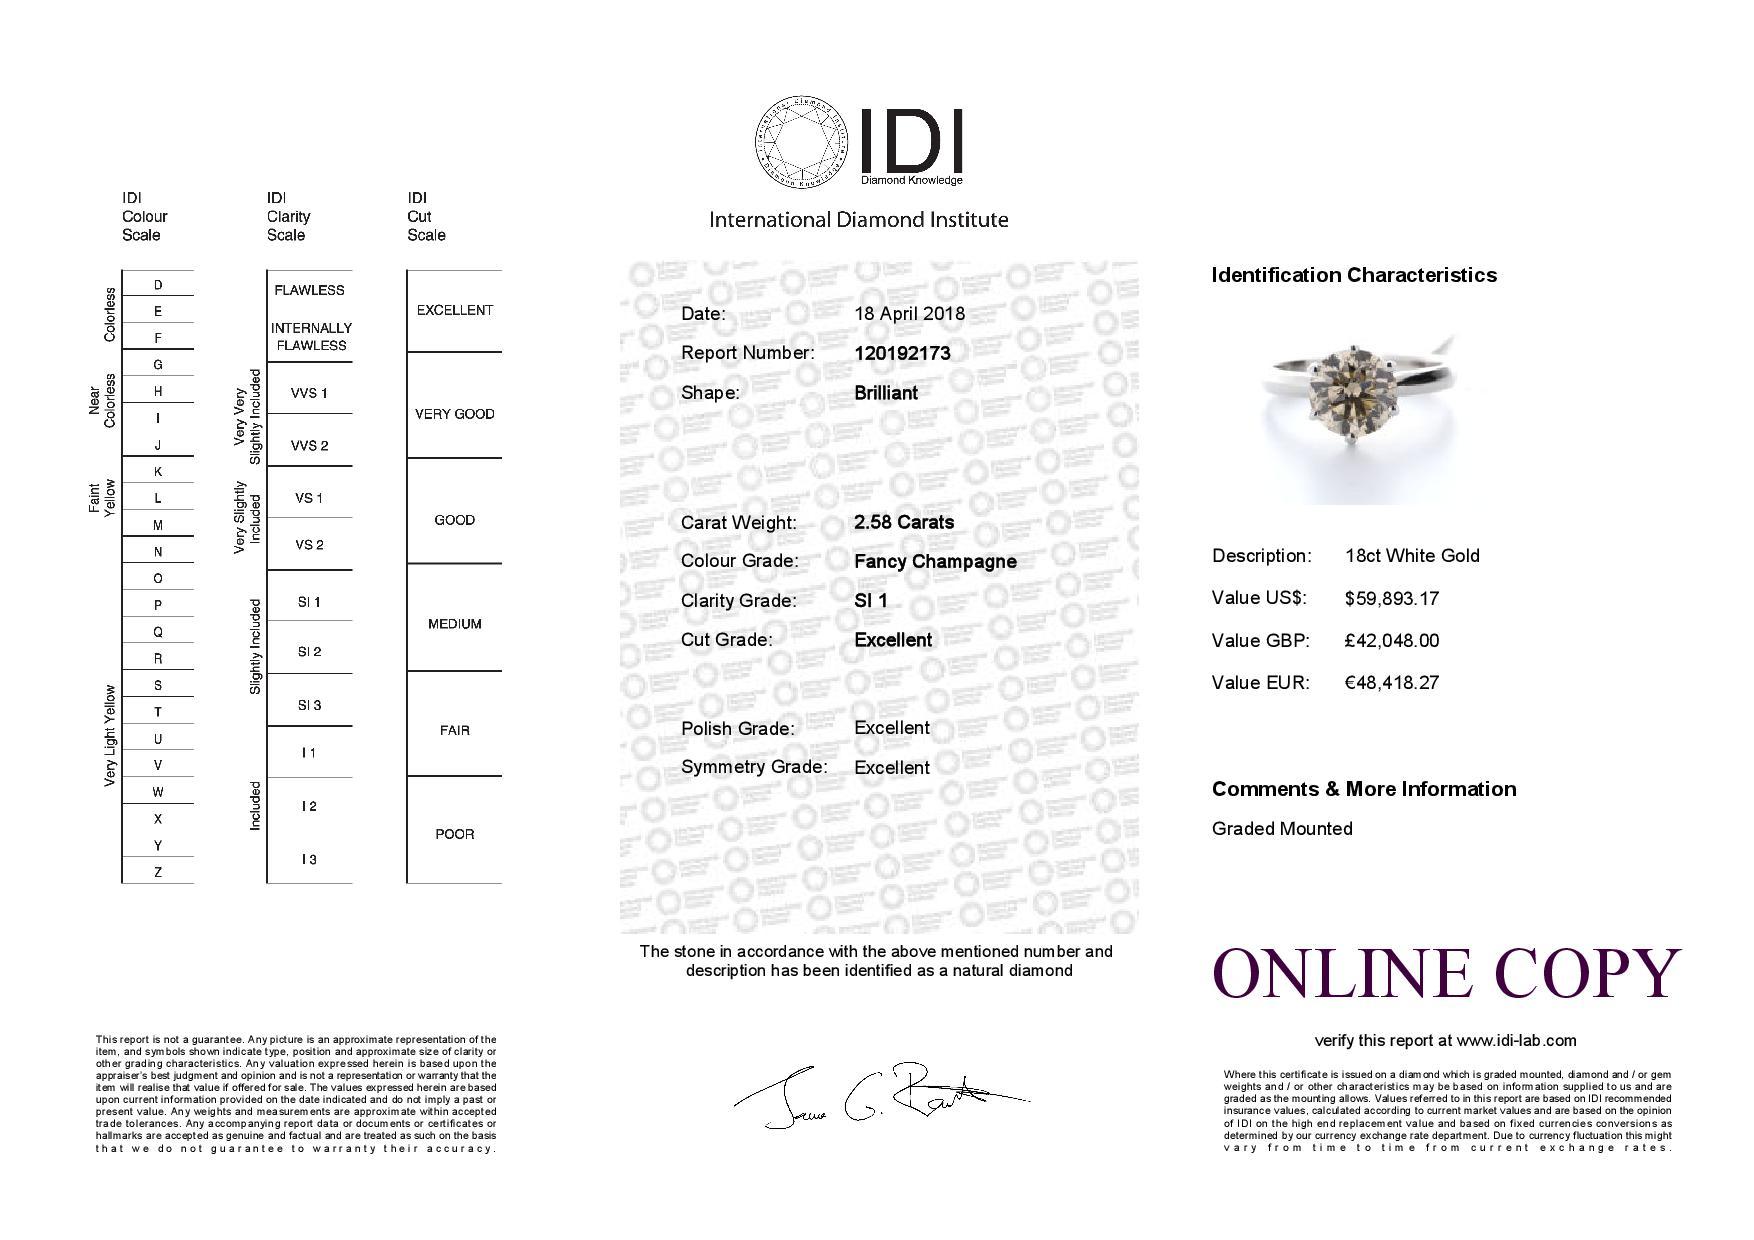 Lot 19 - 18ct White Gold Single Stone Claw Set Diamond Ring 2.58 Carats